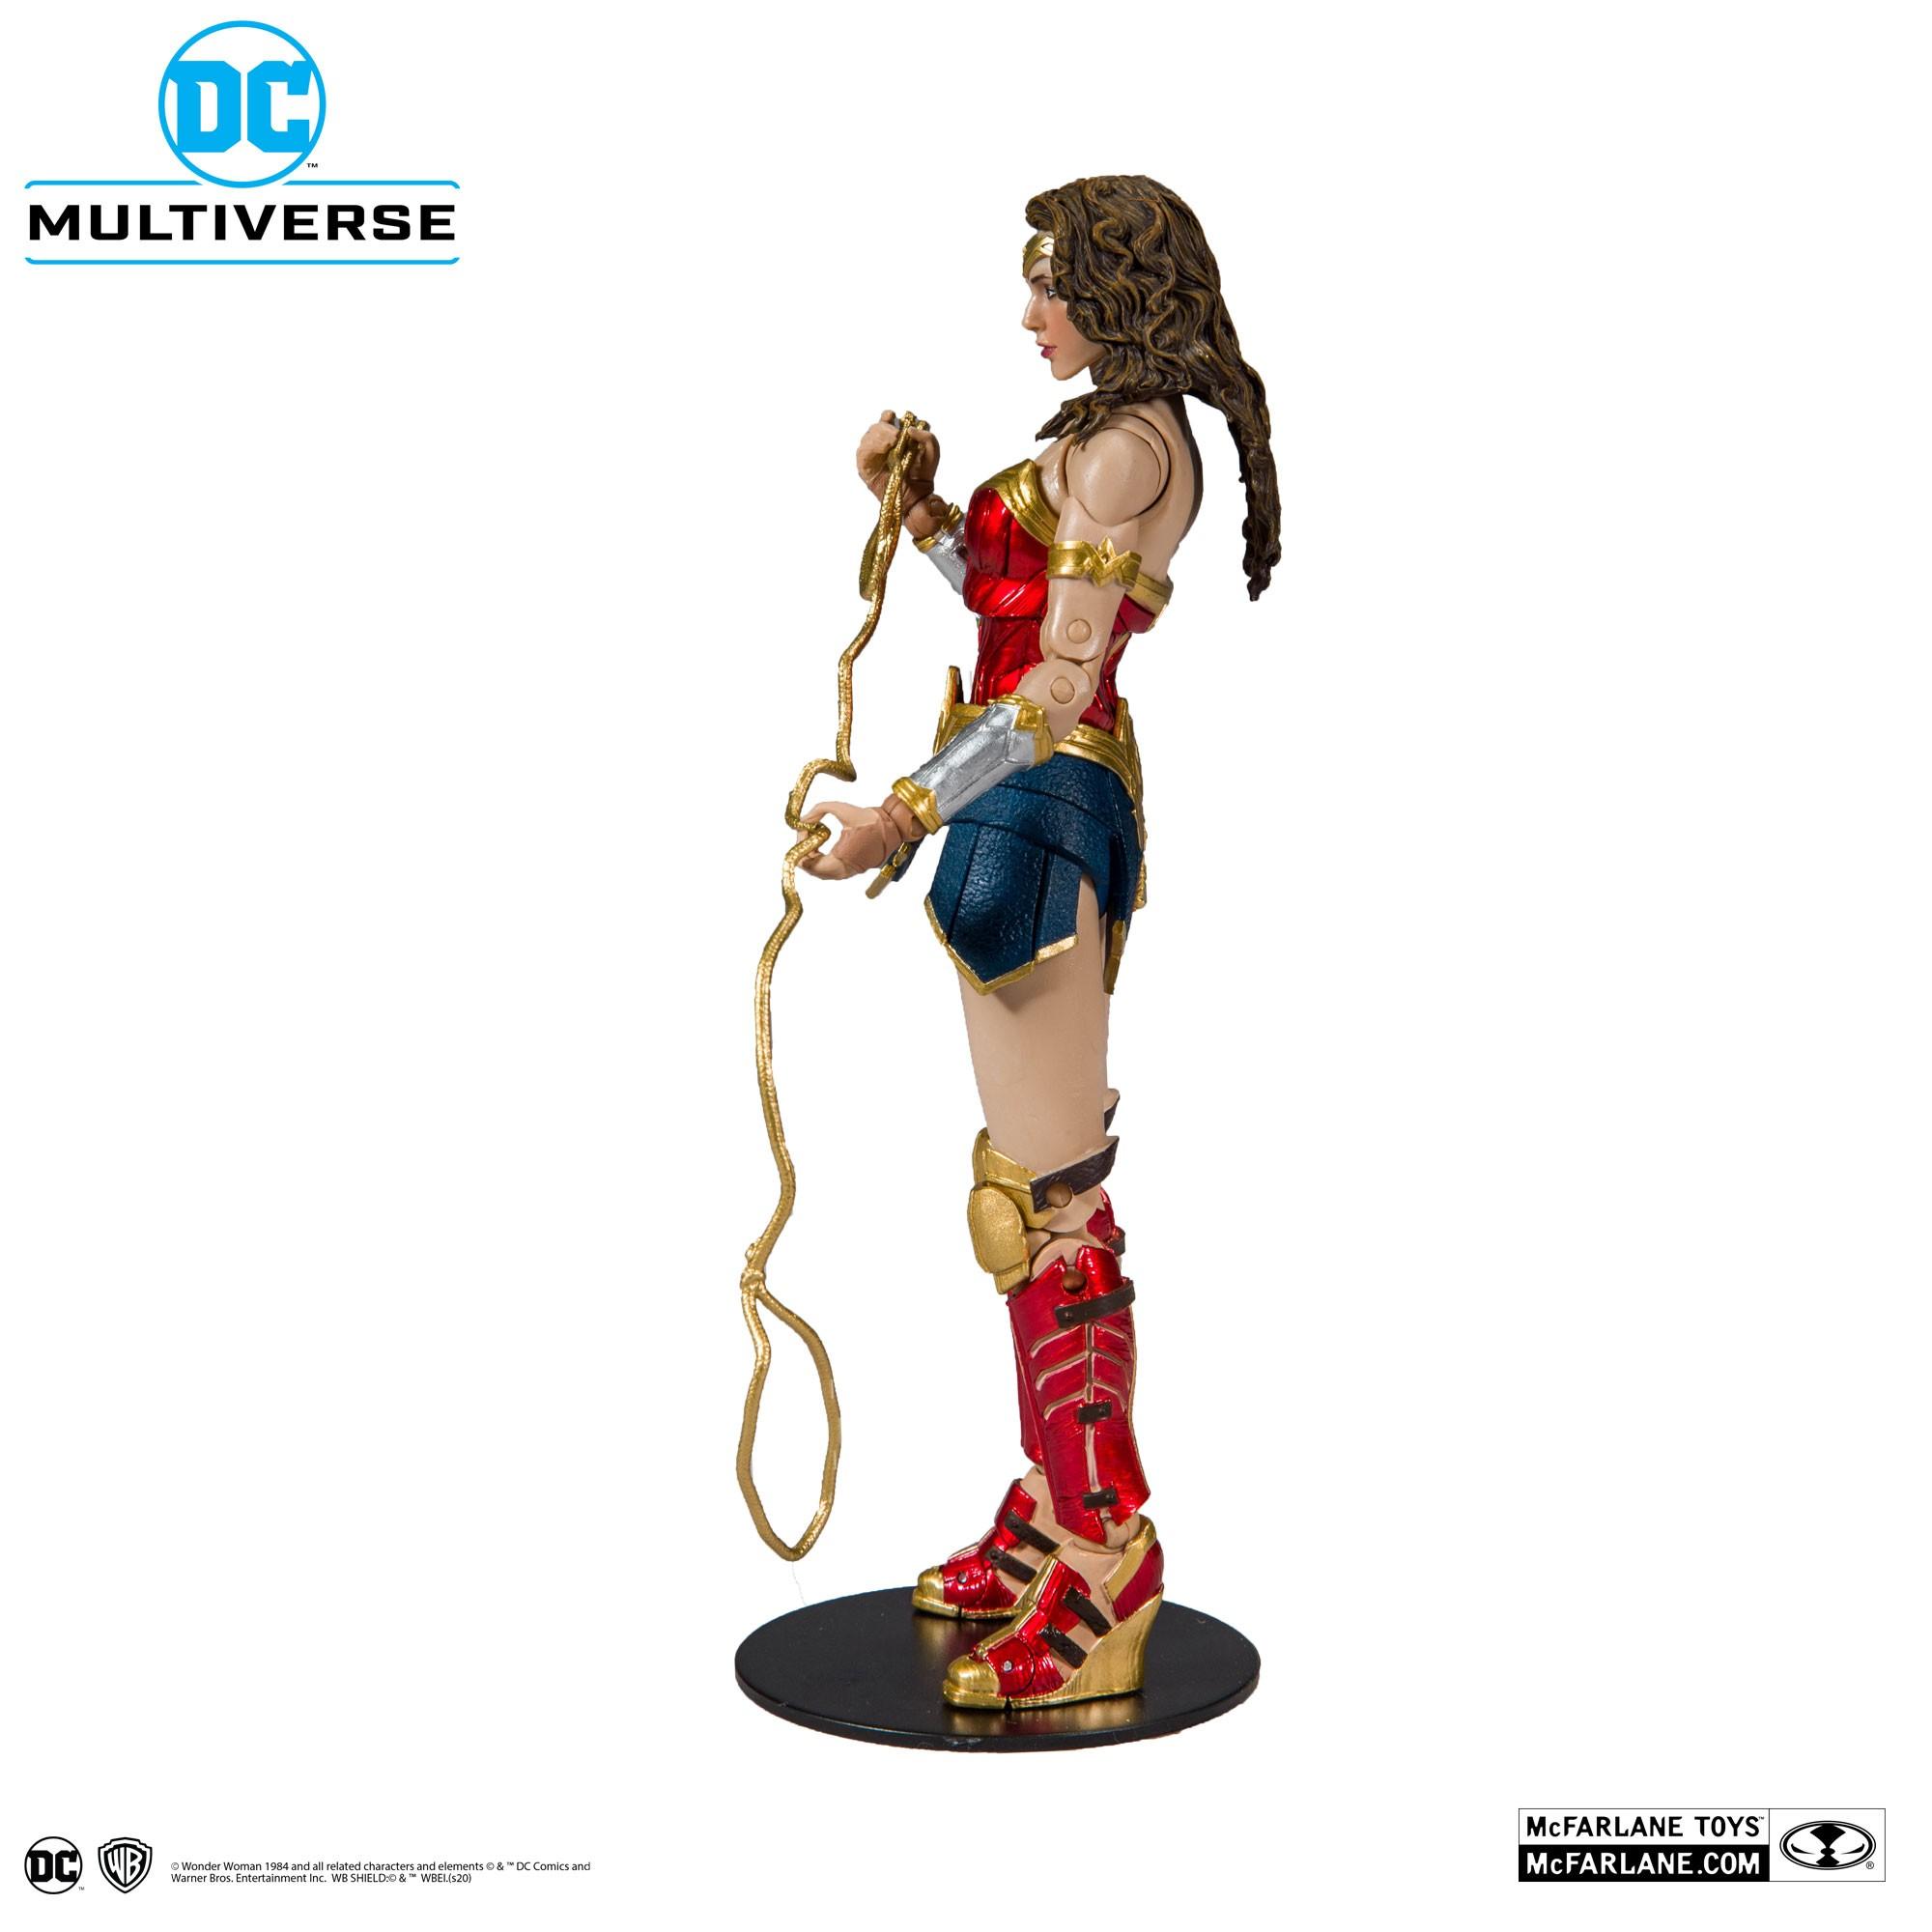 Action Figure Mulher Maravilha (Wonder Woman): Wonde Woman 1984 (DC Multiverse) - McFarlane Toys